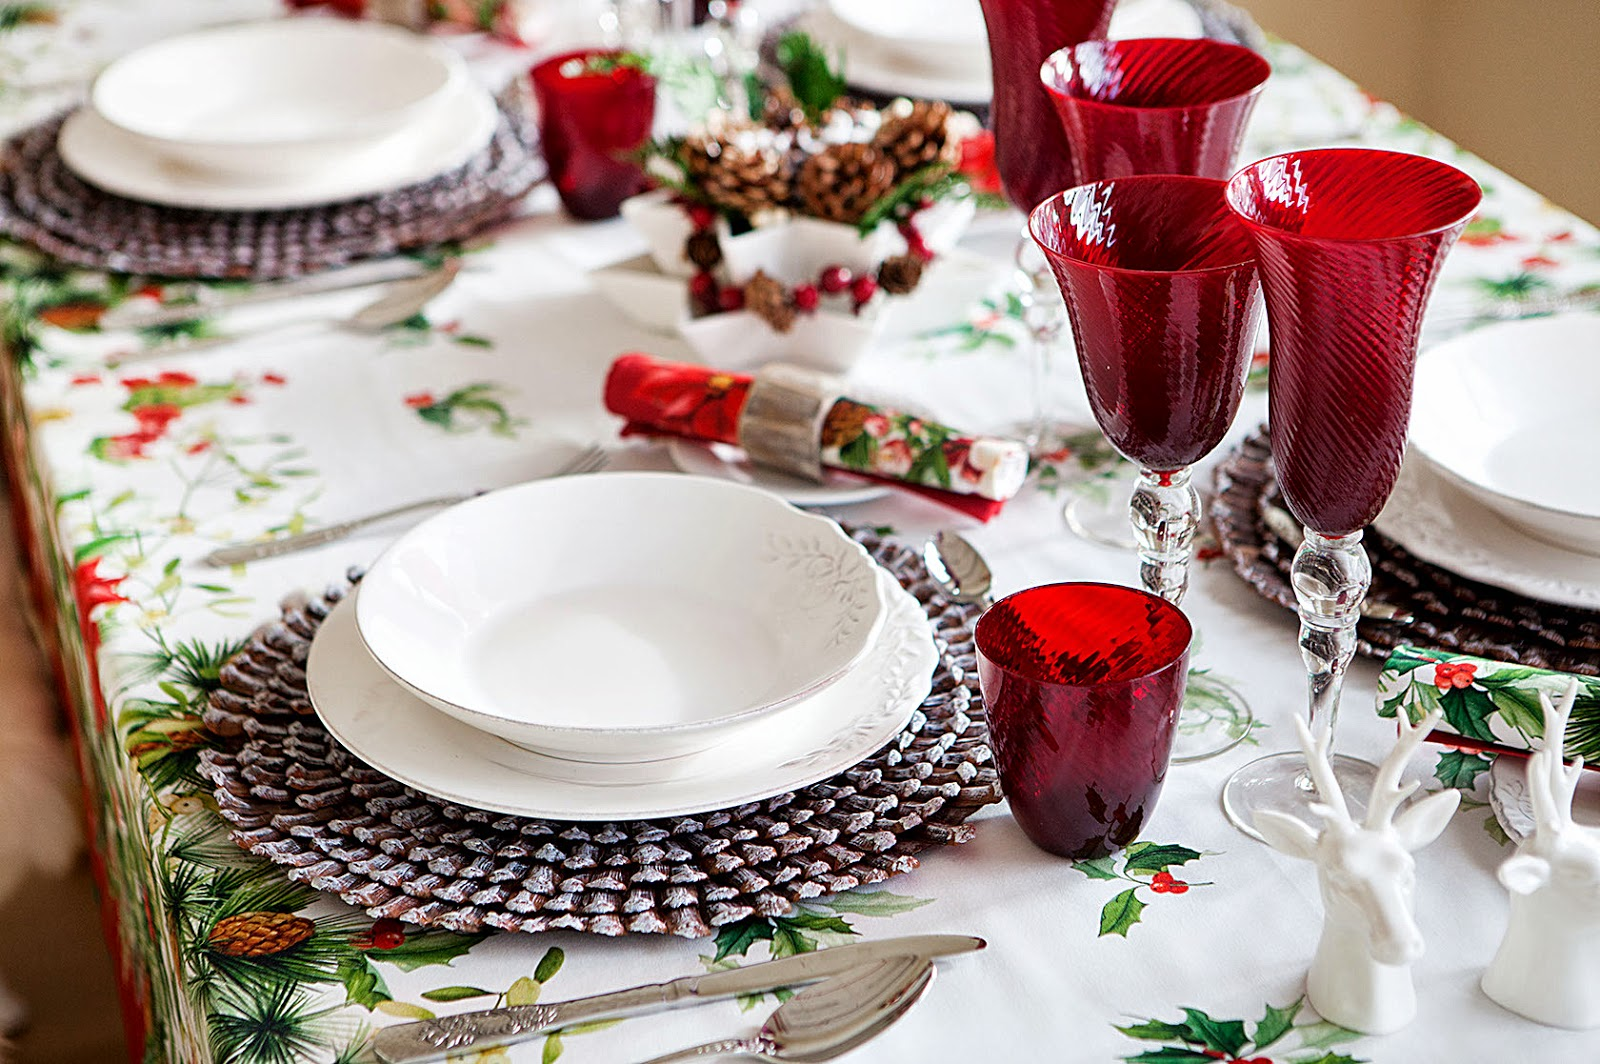 Addobbi Natalizi Zara.Zara Home Tablecloth Christmas Collection 2014 La Burbuja Rosa